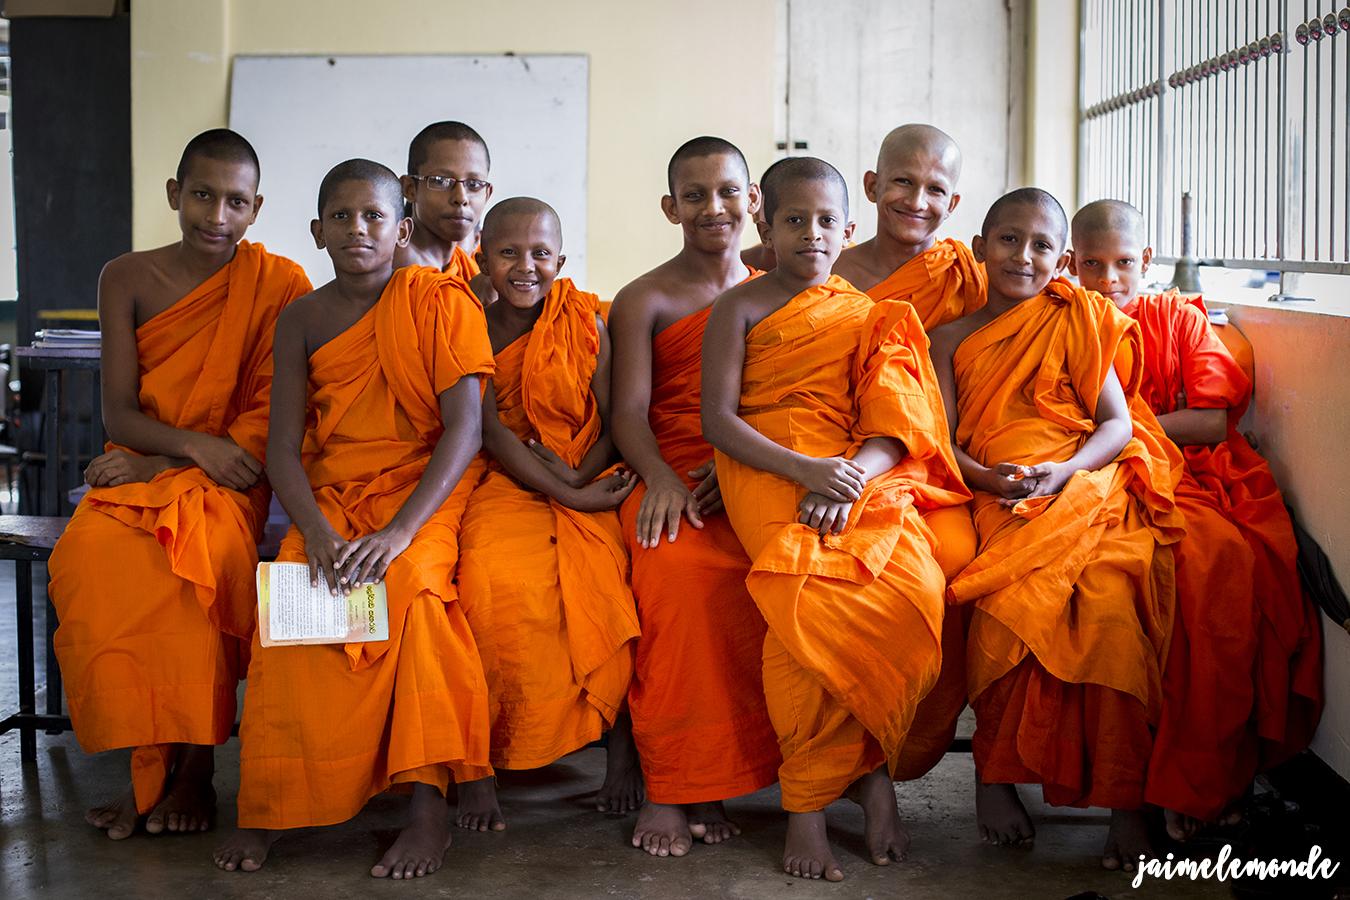 Portraits de voyage au Sri Lanka ©jaimelemonde (16)